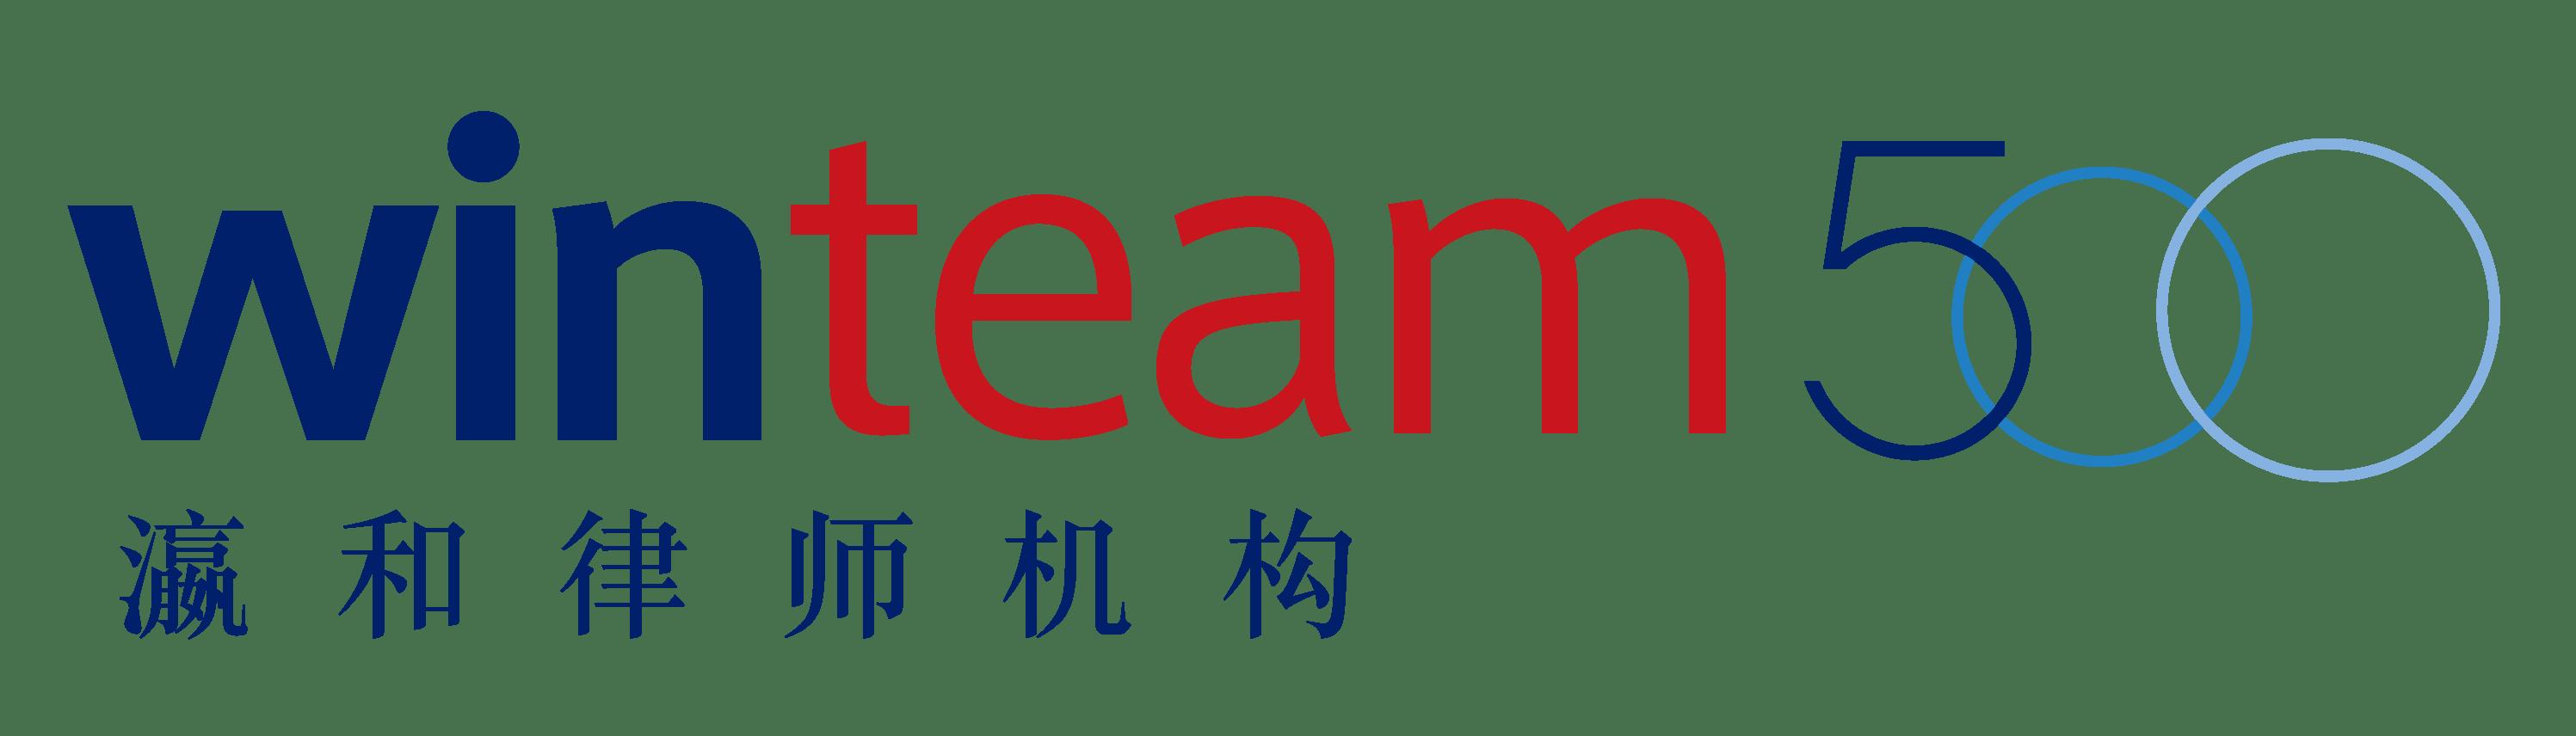 Winteam500 company logo